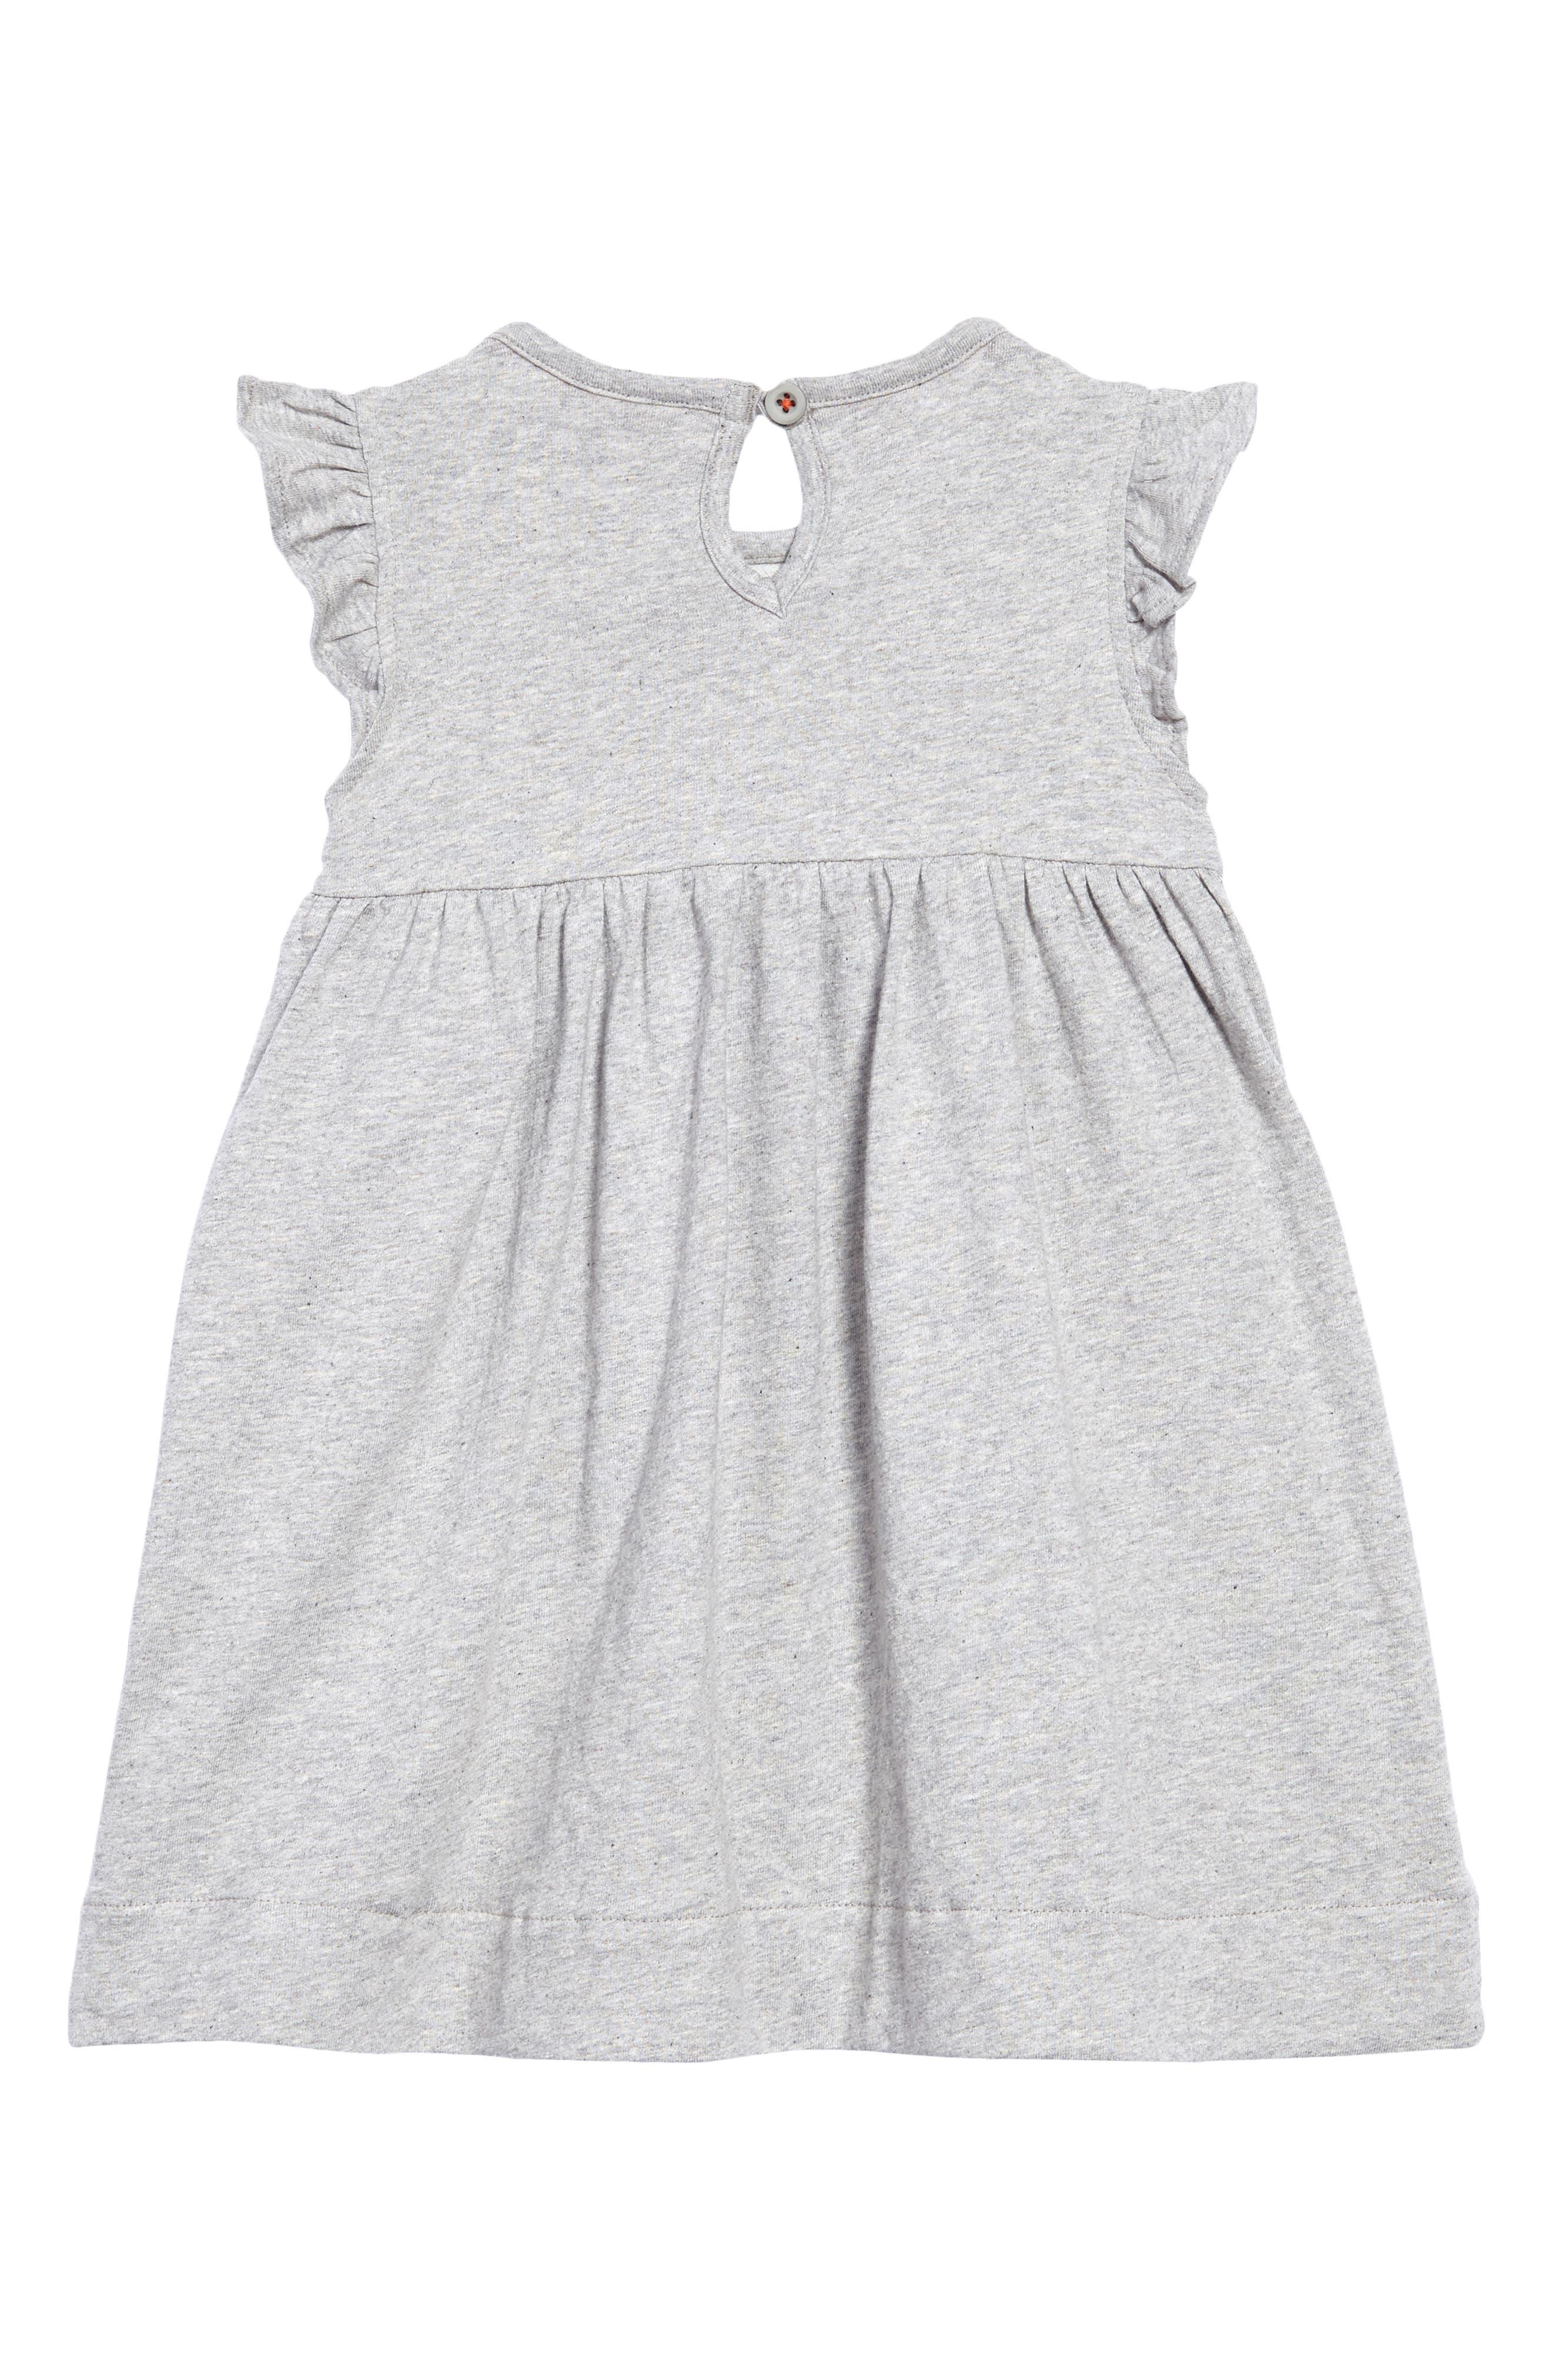 Appliqué Pocket Dress,                             Alternate thumbnail 2, color,                             Grey Marl